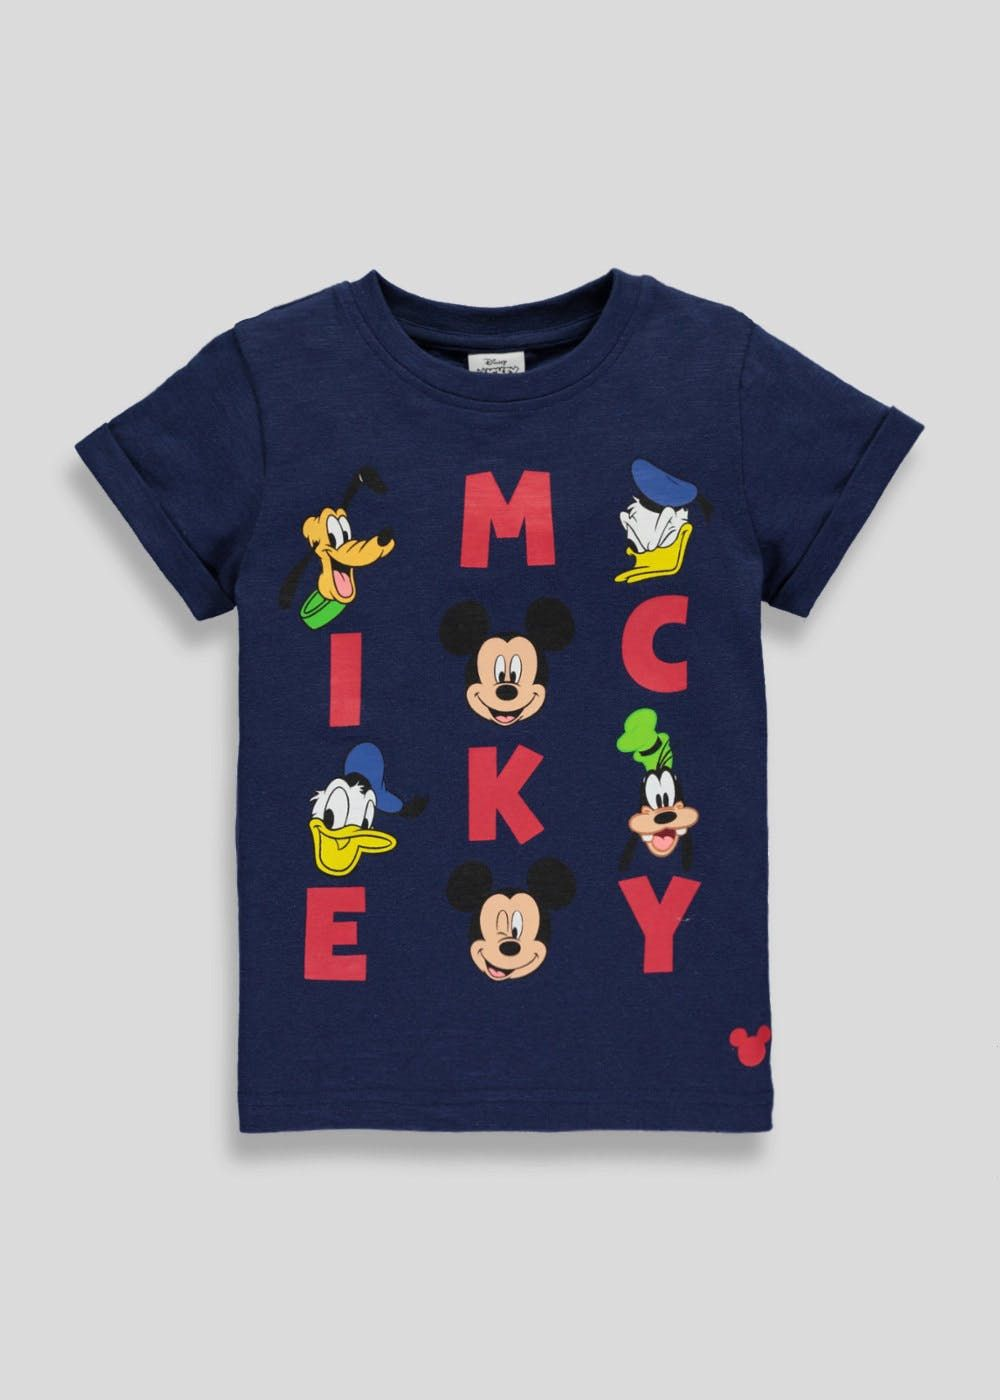 c170a4f339c2 Kids Disney Mickey Mouse T-Shirt (3mths-5yrs) – Blue